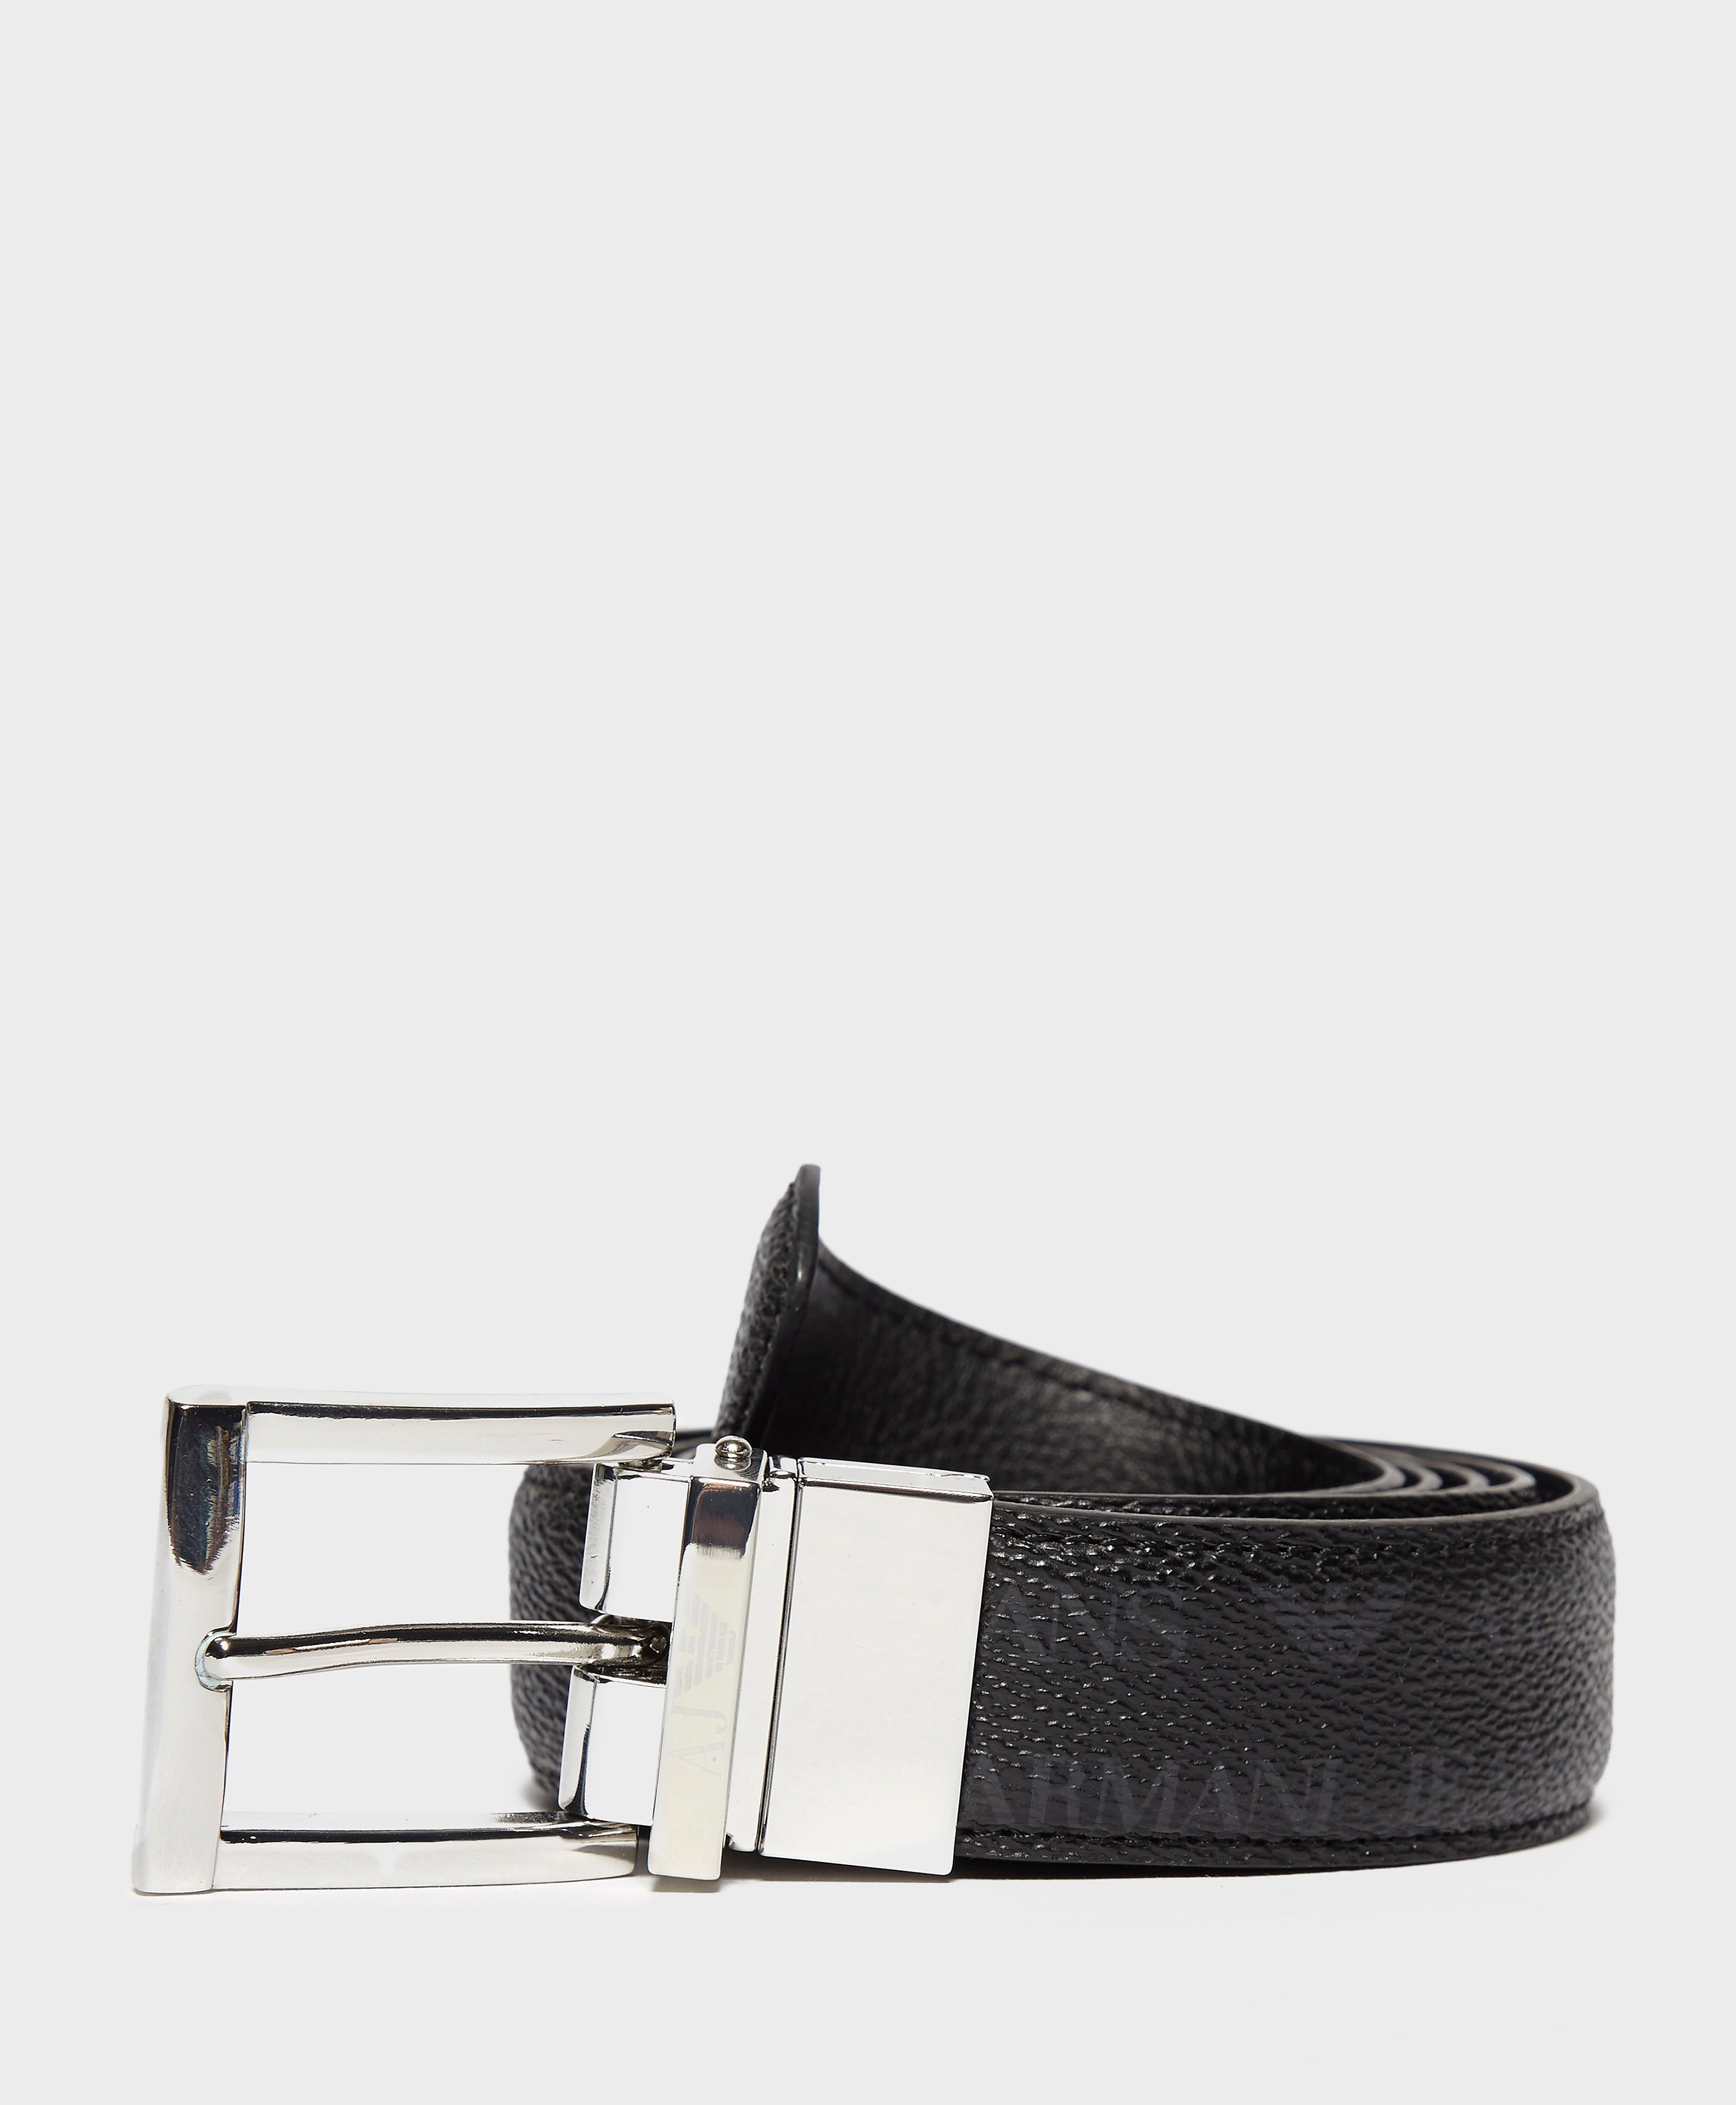 Armani Jeans AO Logo Belt